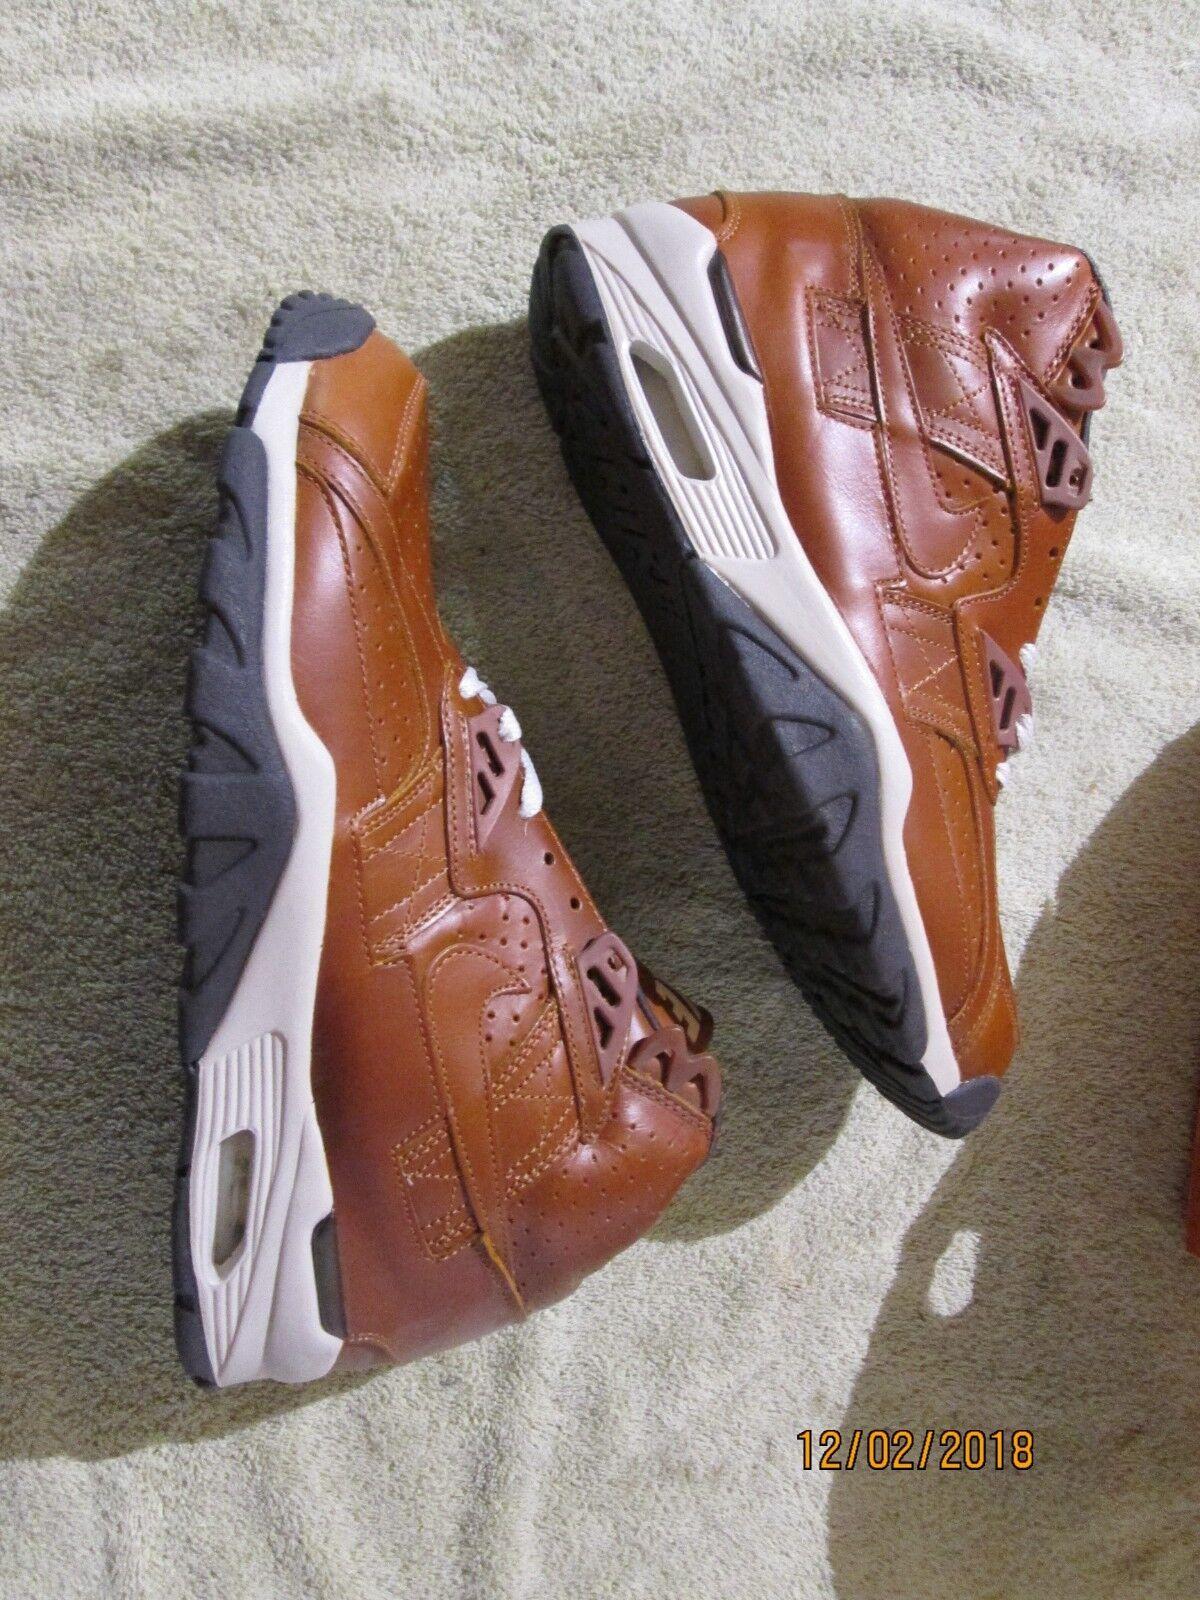 Men's Nike Air Trainer SC premium 2003 OG Curry pack 306969-771 Size 10.5